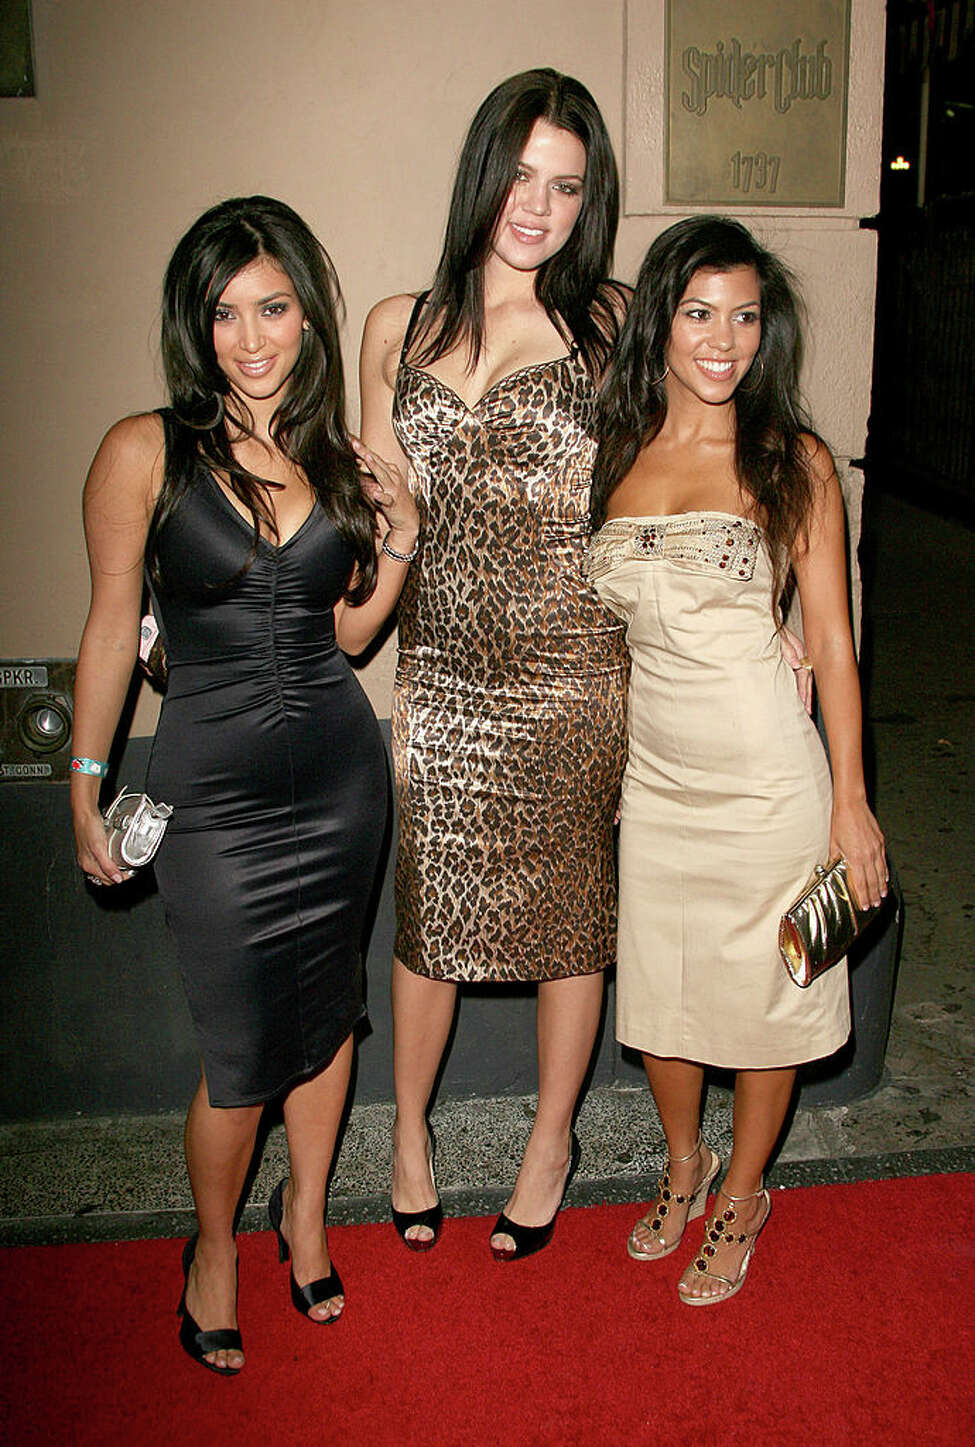 Keep clicking to see the Kardashian-Jenners through the years.July 2006: Kim Kardashian, Khloe Kardashian and Kourtney Kardashian during Midsummer Night's Dream: A Magic Night of Poker - Arrivals at The Avalon in Hollywood, California, United States.